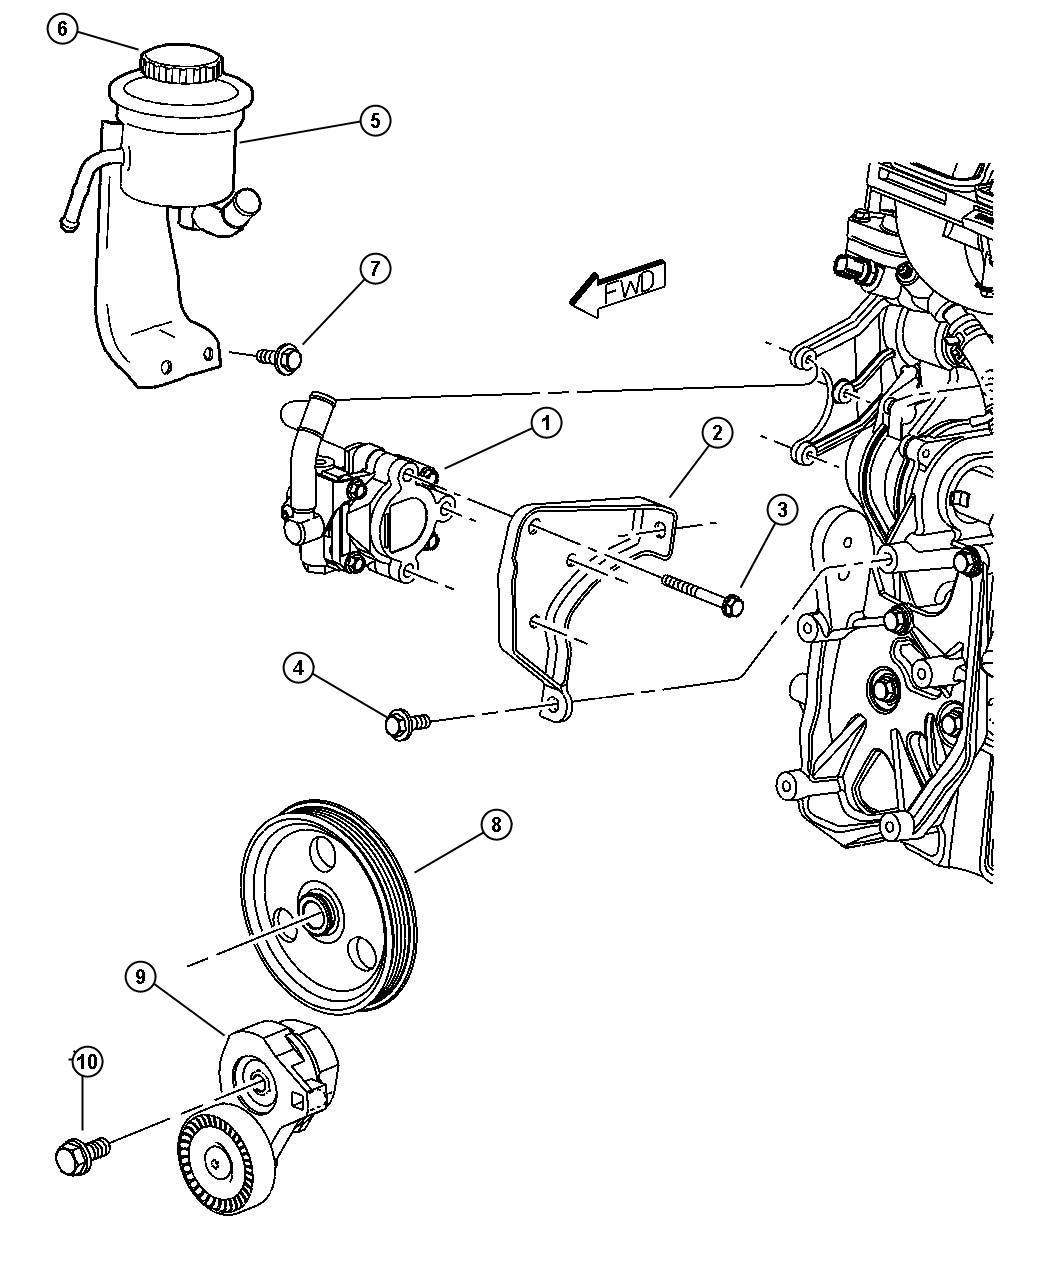 Chrysler PT Cruiser Tensioner, used for: tensioner and